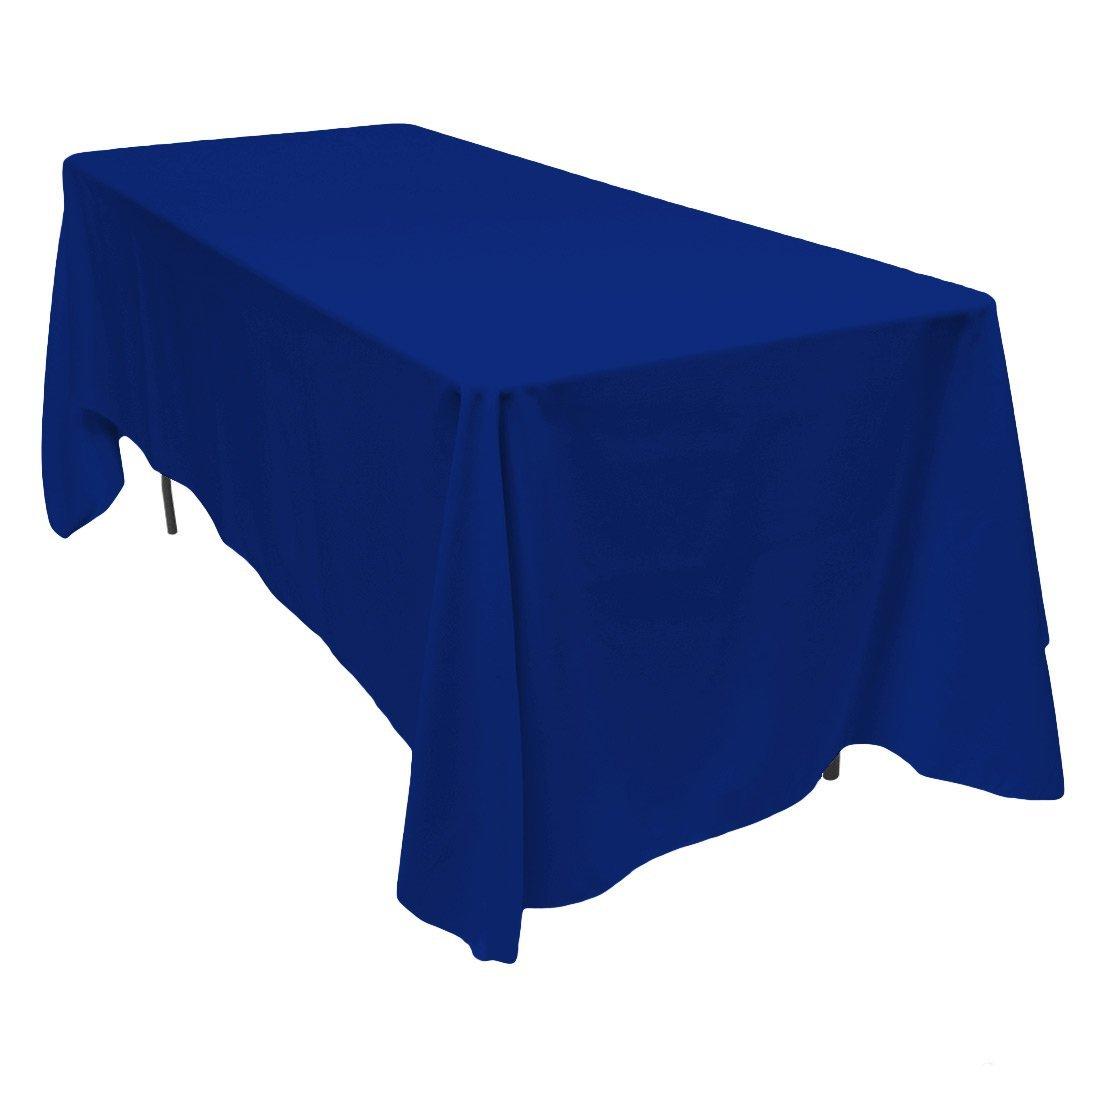 Toalha azul royal banquete